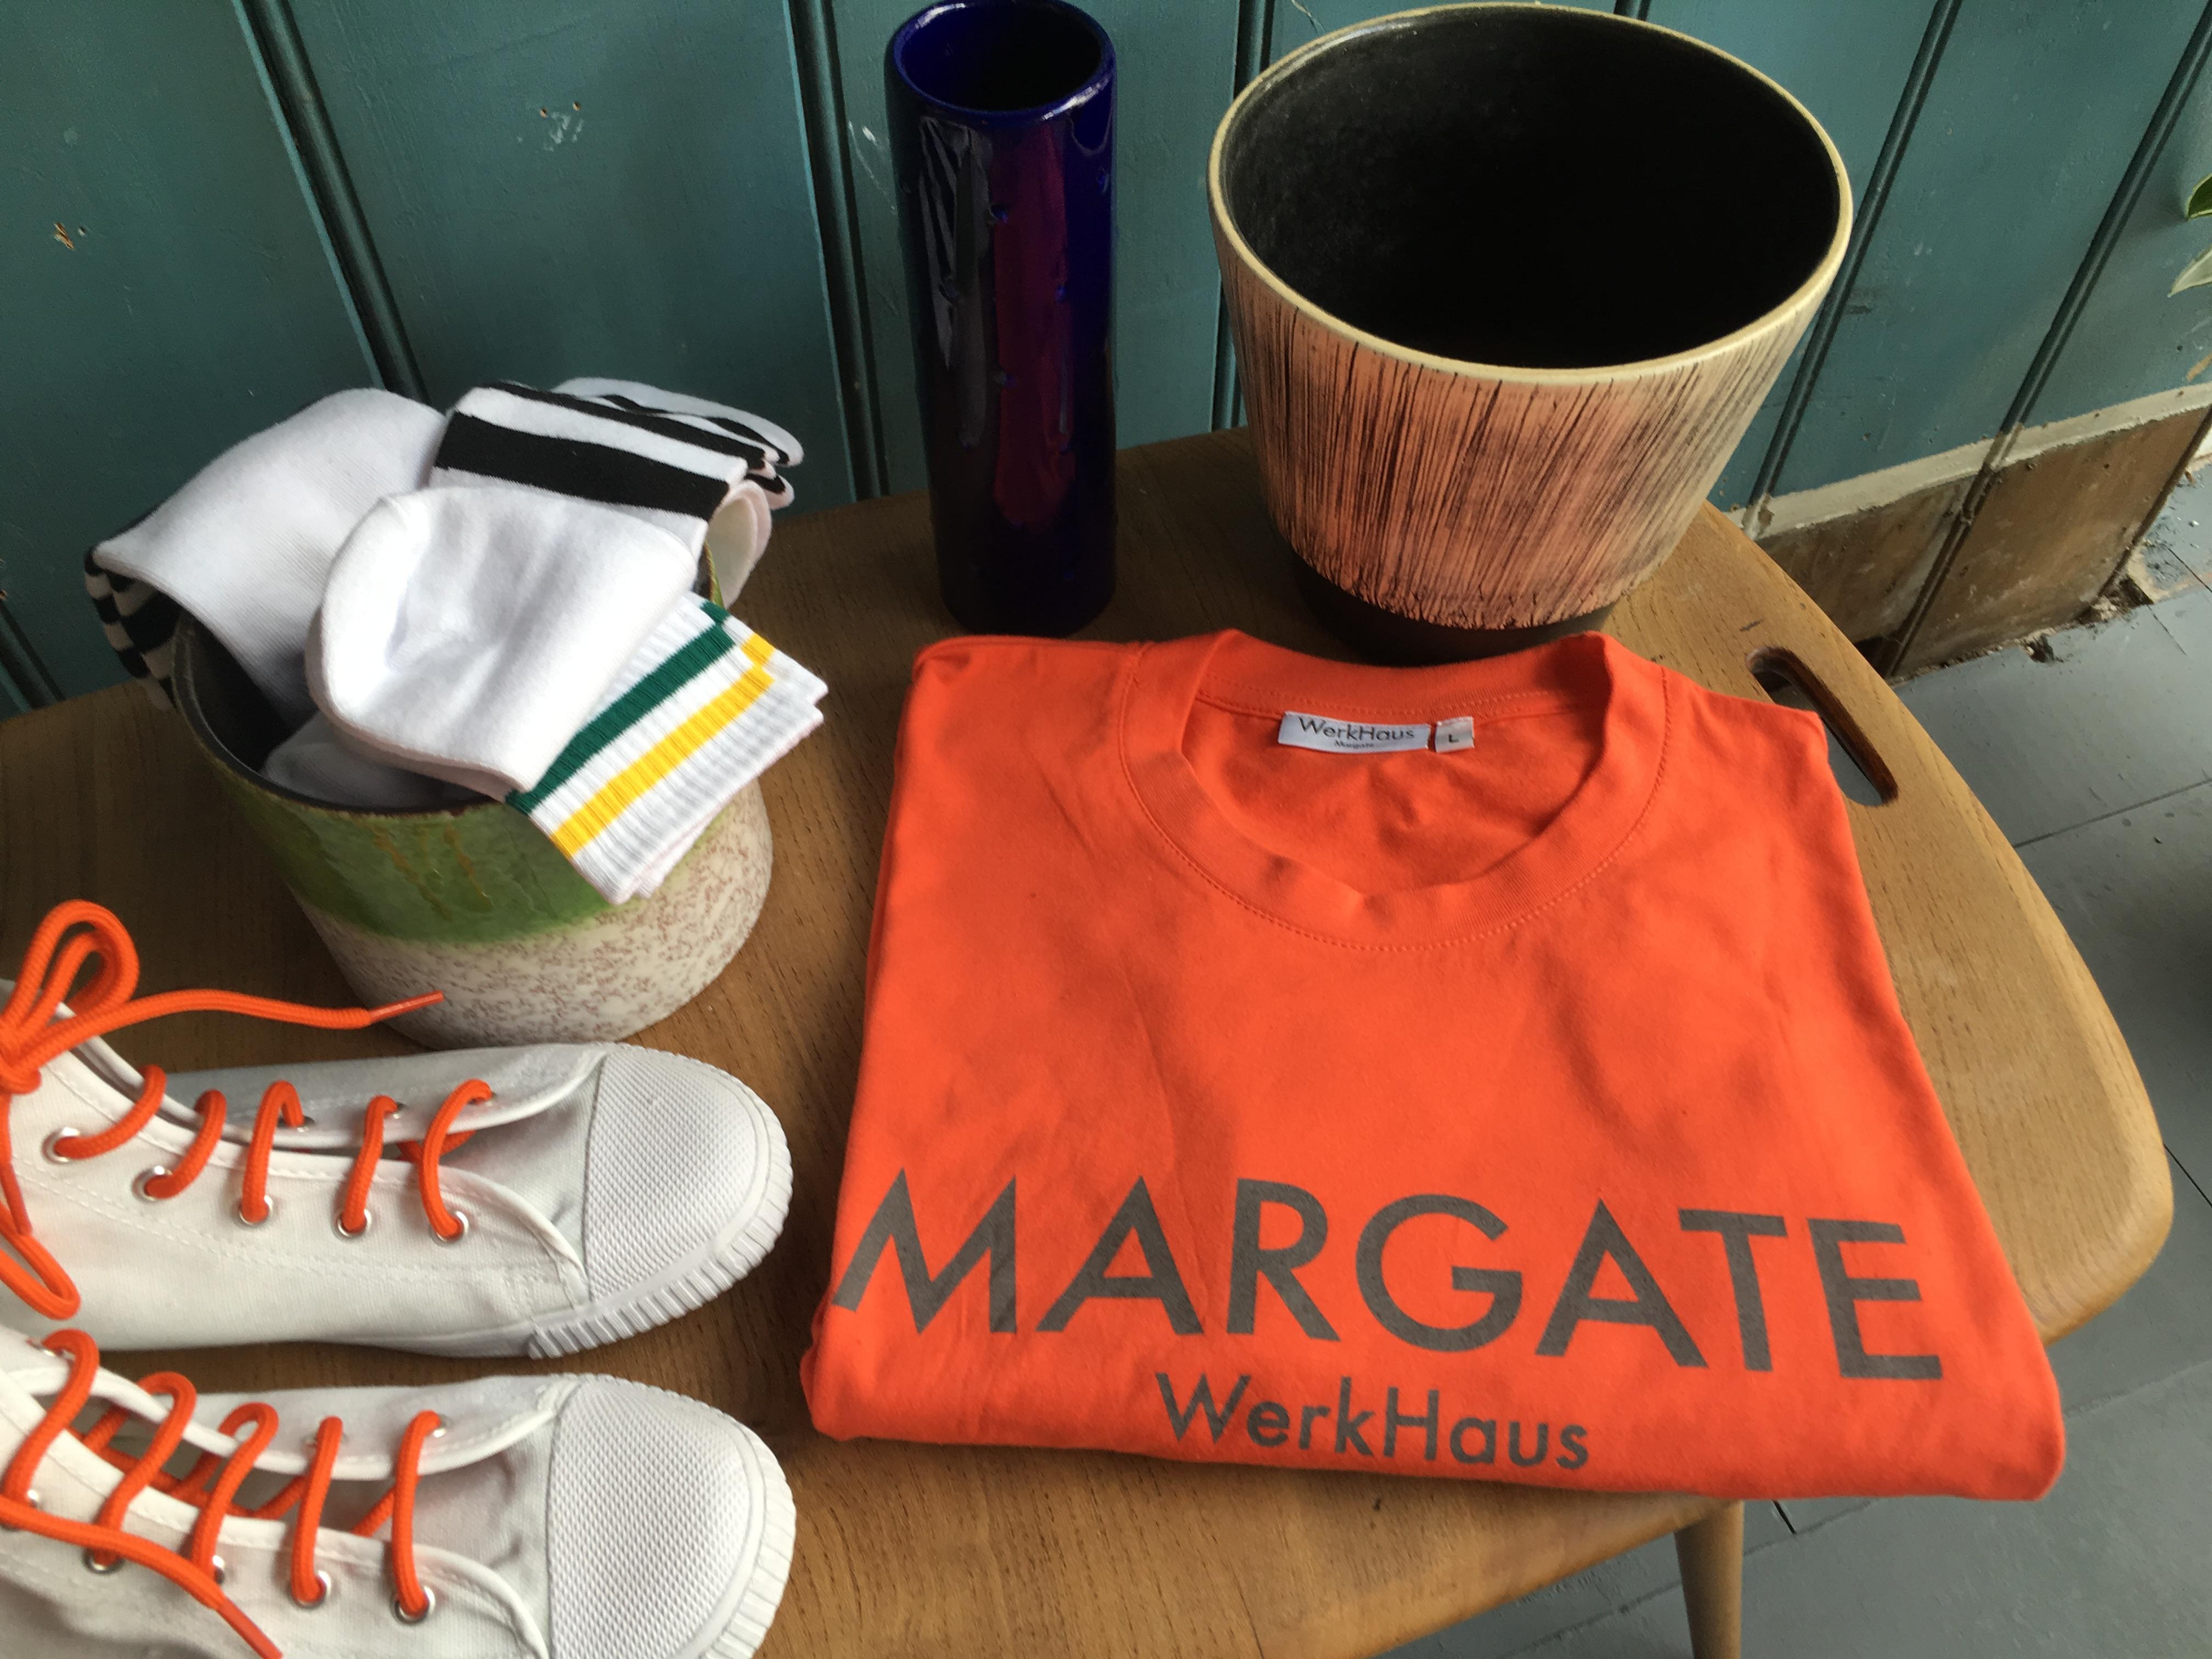 Margate WerkHaus- T-shirt